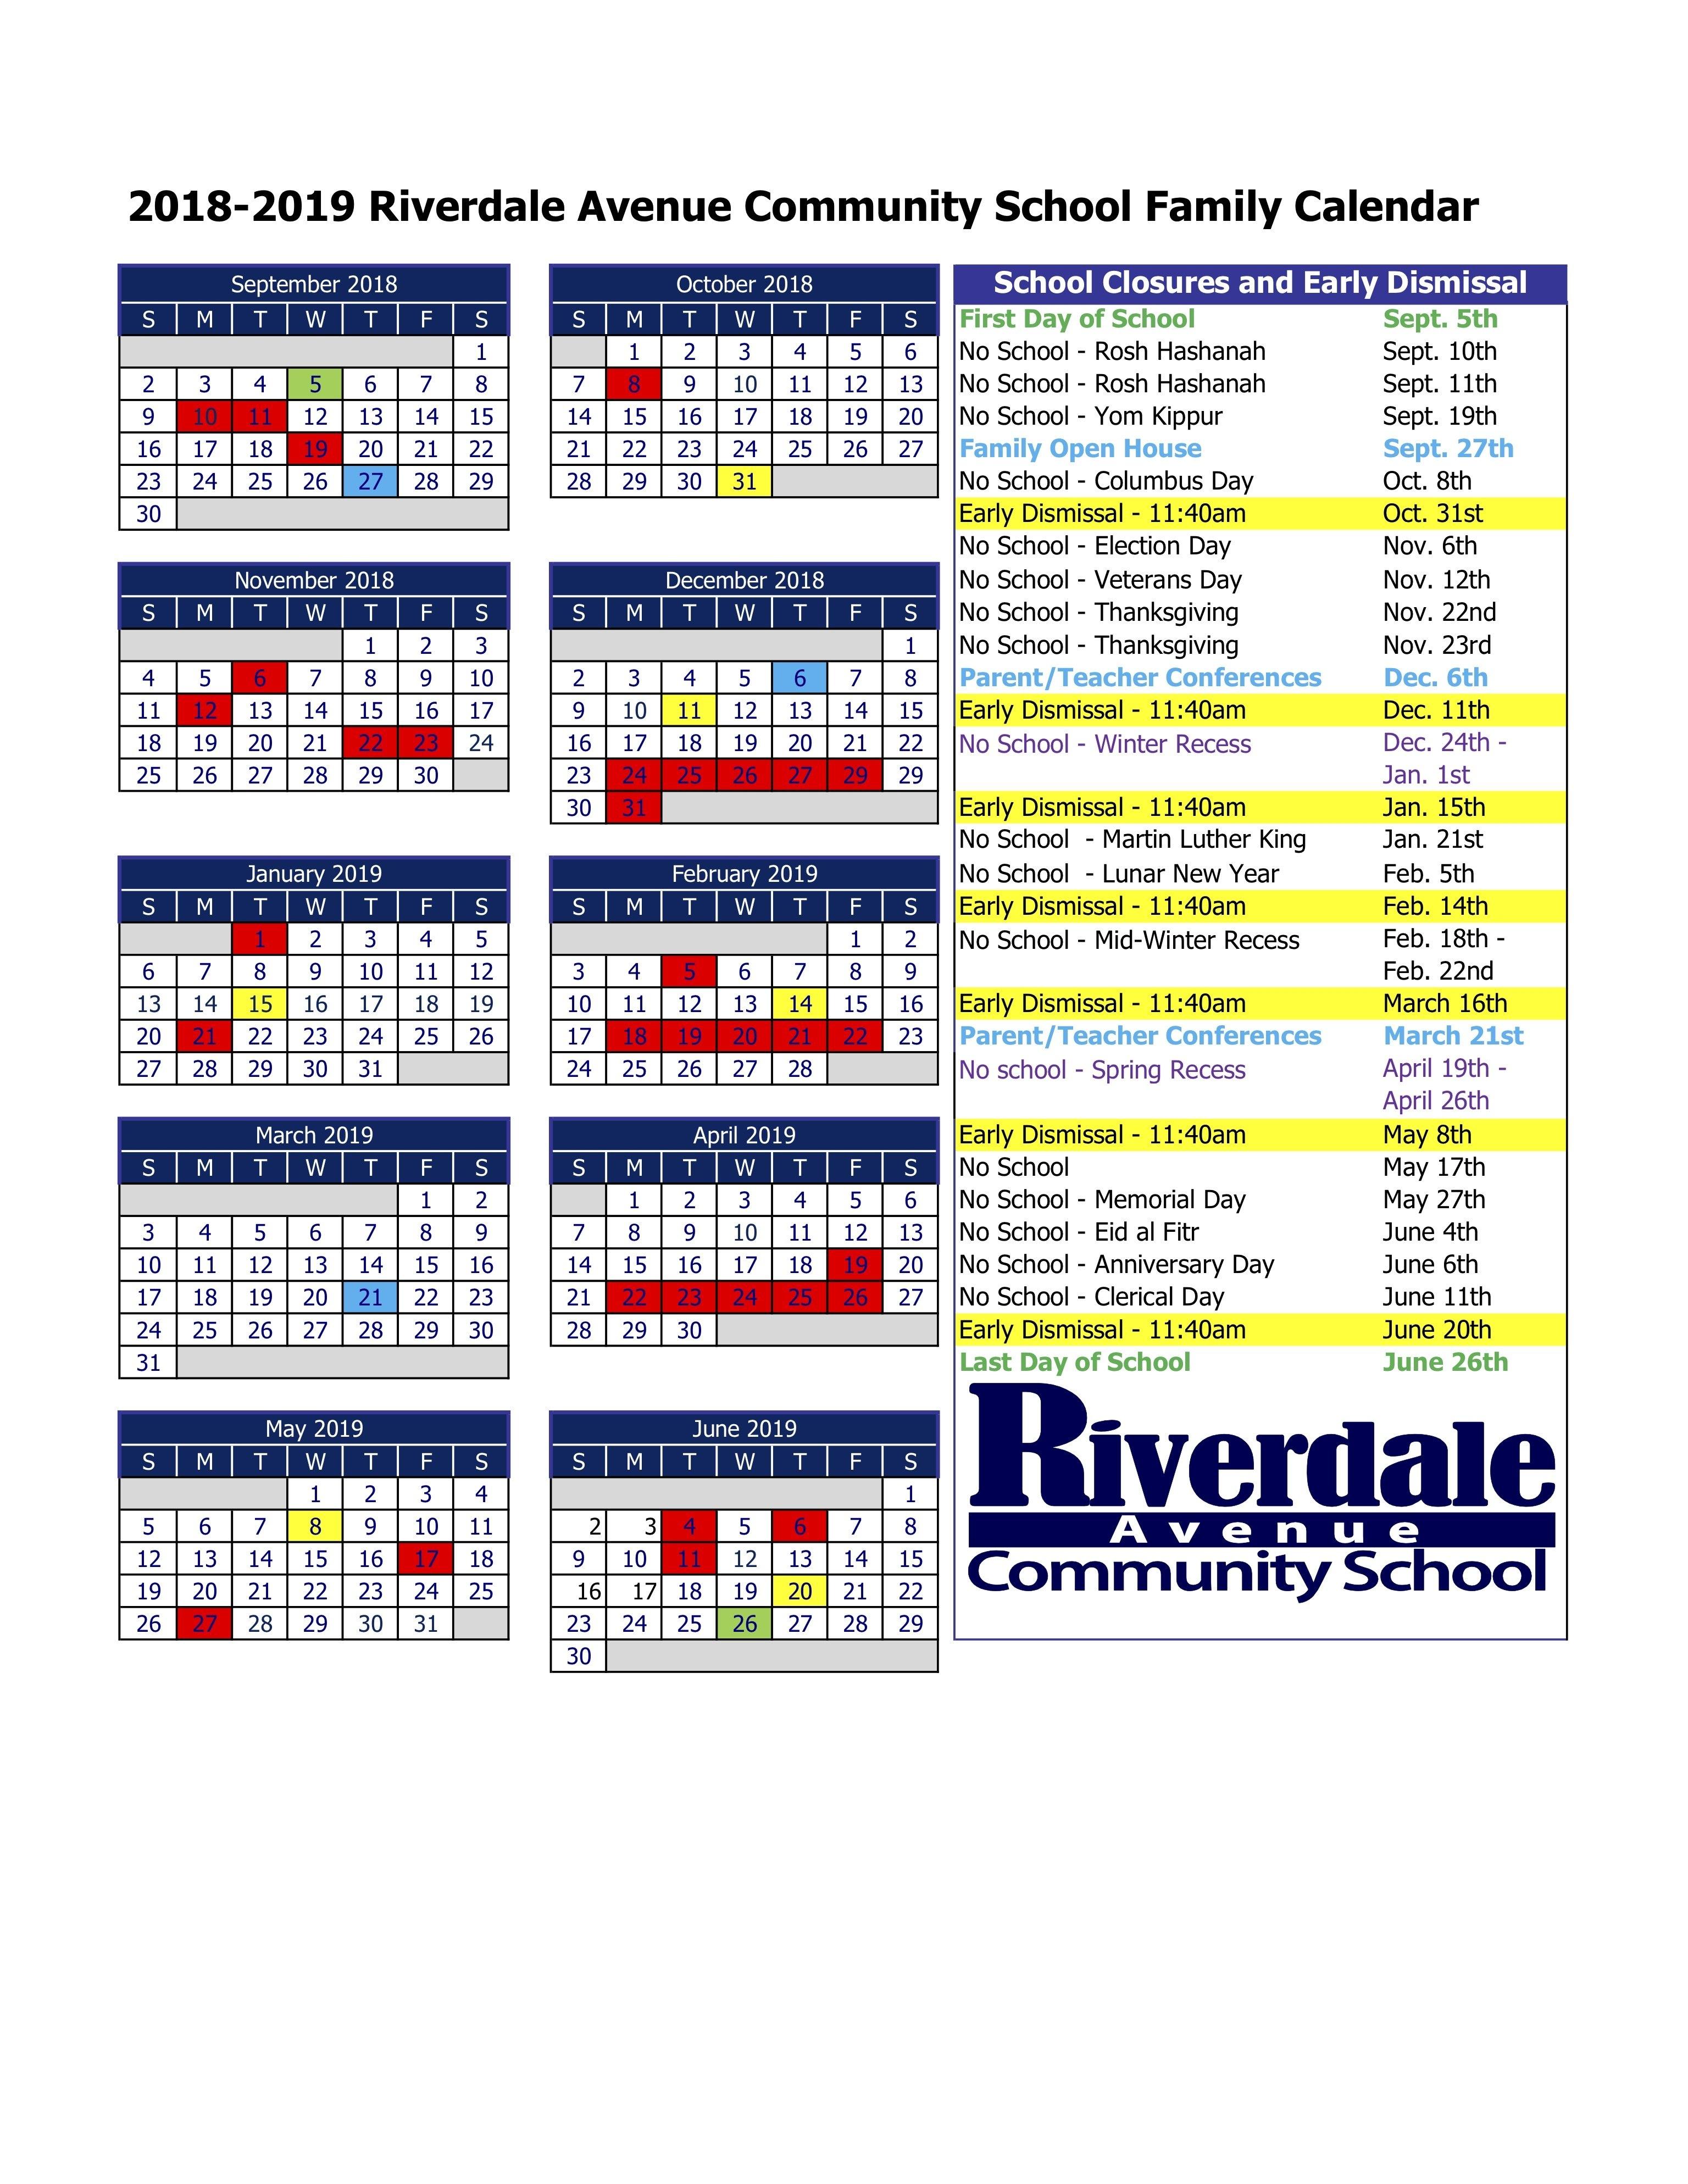 2018-2019 School Calendar – Riverdale Avenue Community School 9 Lives Calendar 2019